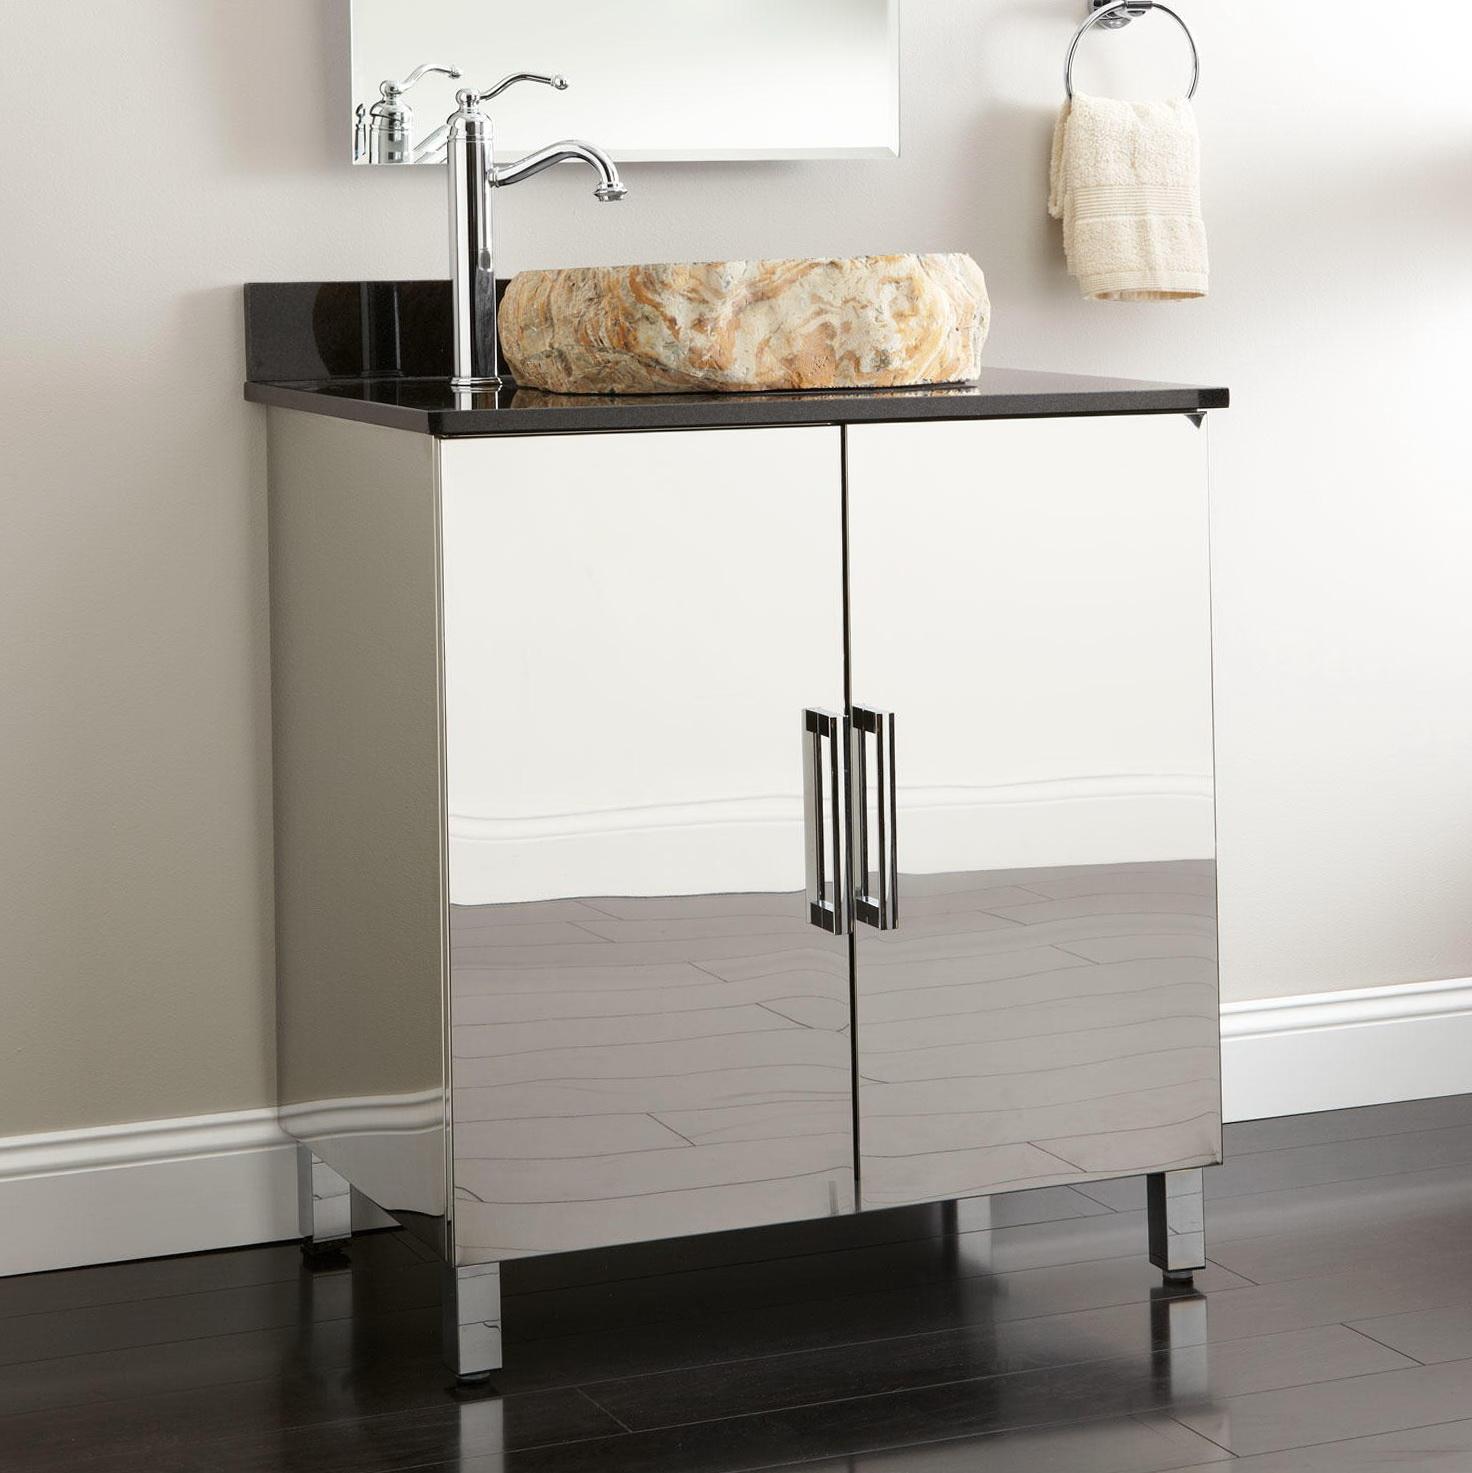 30 Inch Bathroom Vanity With Sink